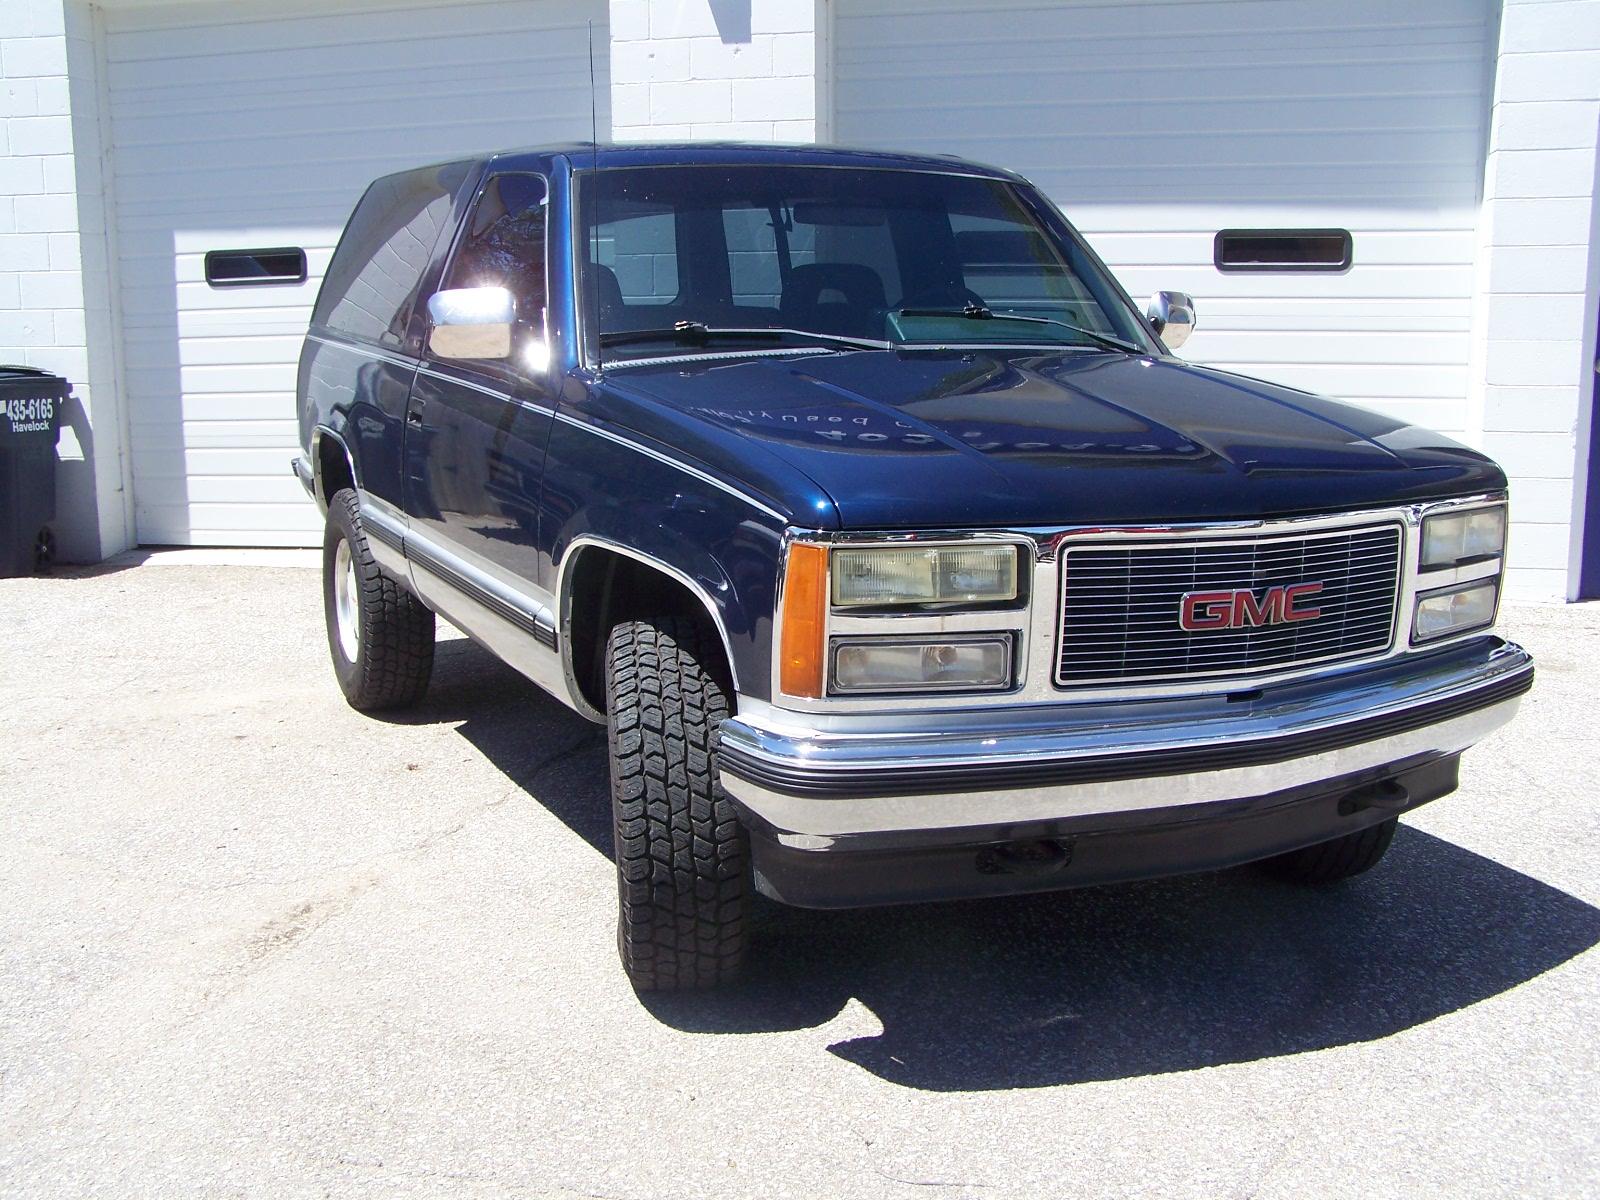 1993 GMC Yukon 002.JPG